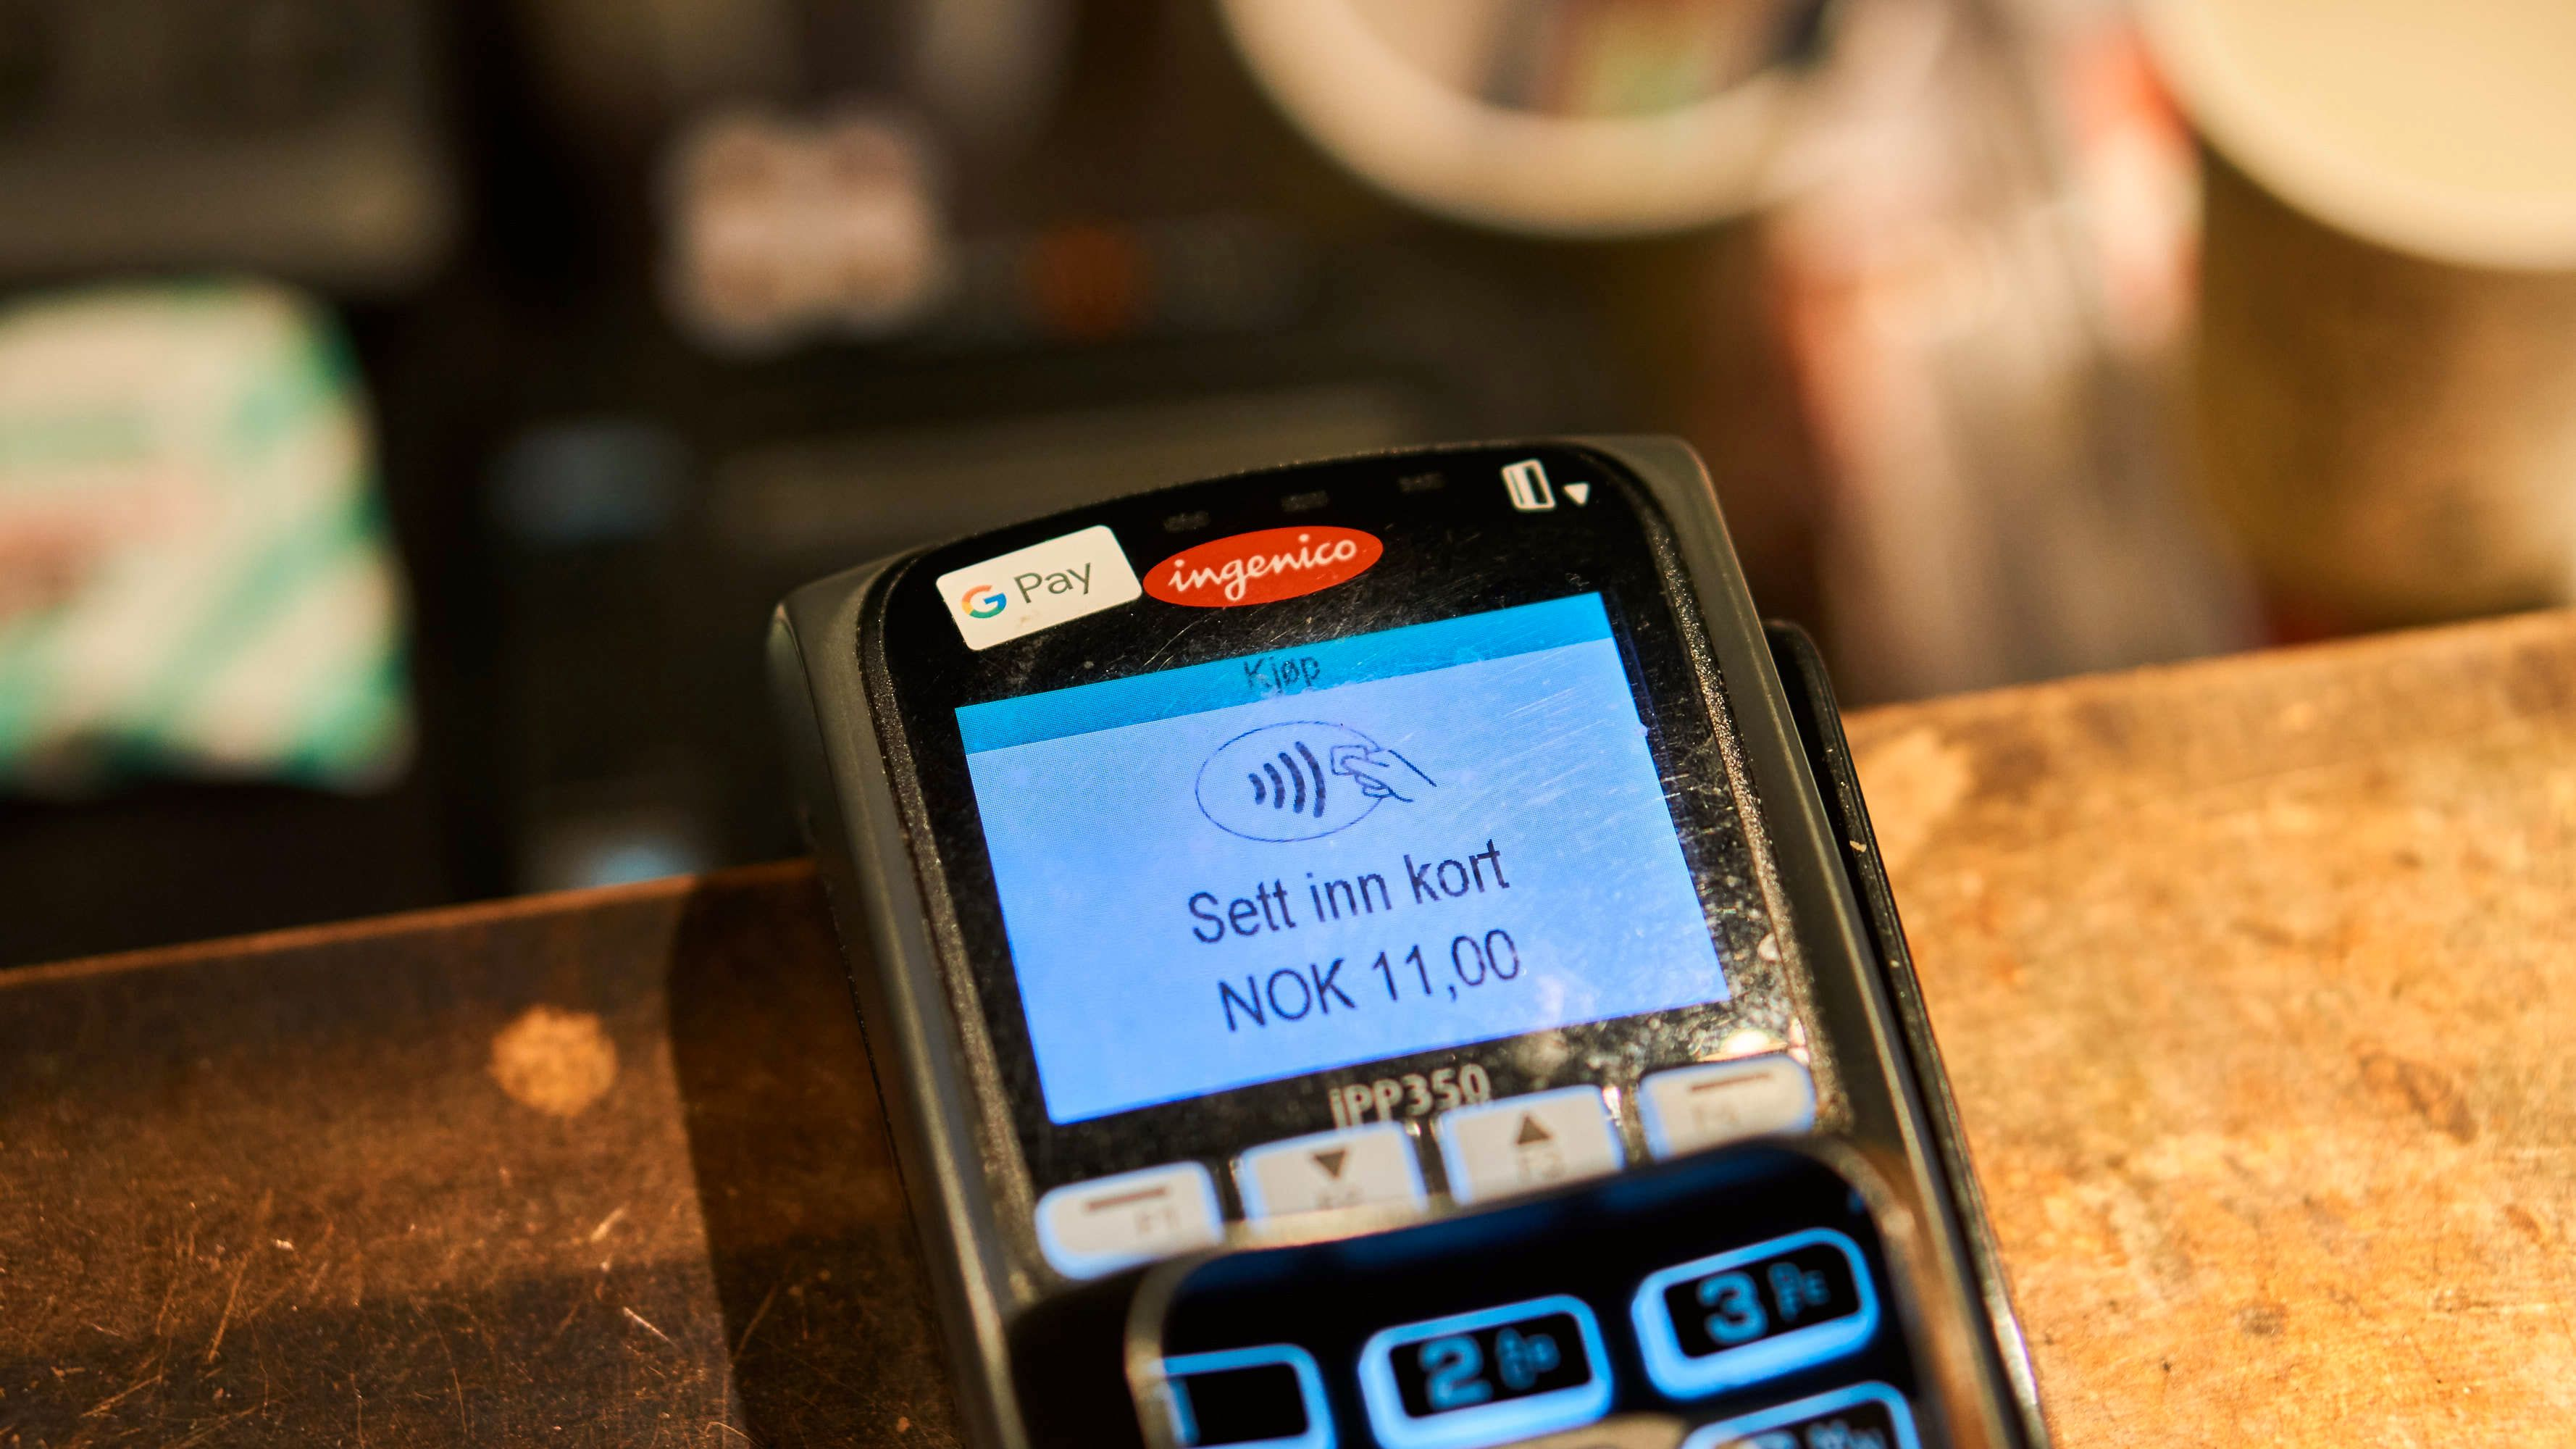 Ser du den vifteformede logoen for kontaktløs betaling kan du bruke kontaktløse kort, eller mobile løsninger som Google Pay og Apple Pay også.